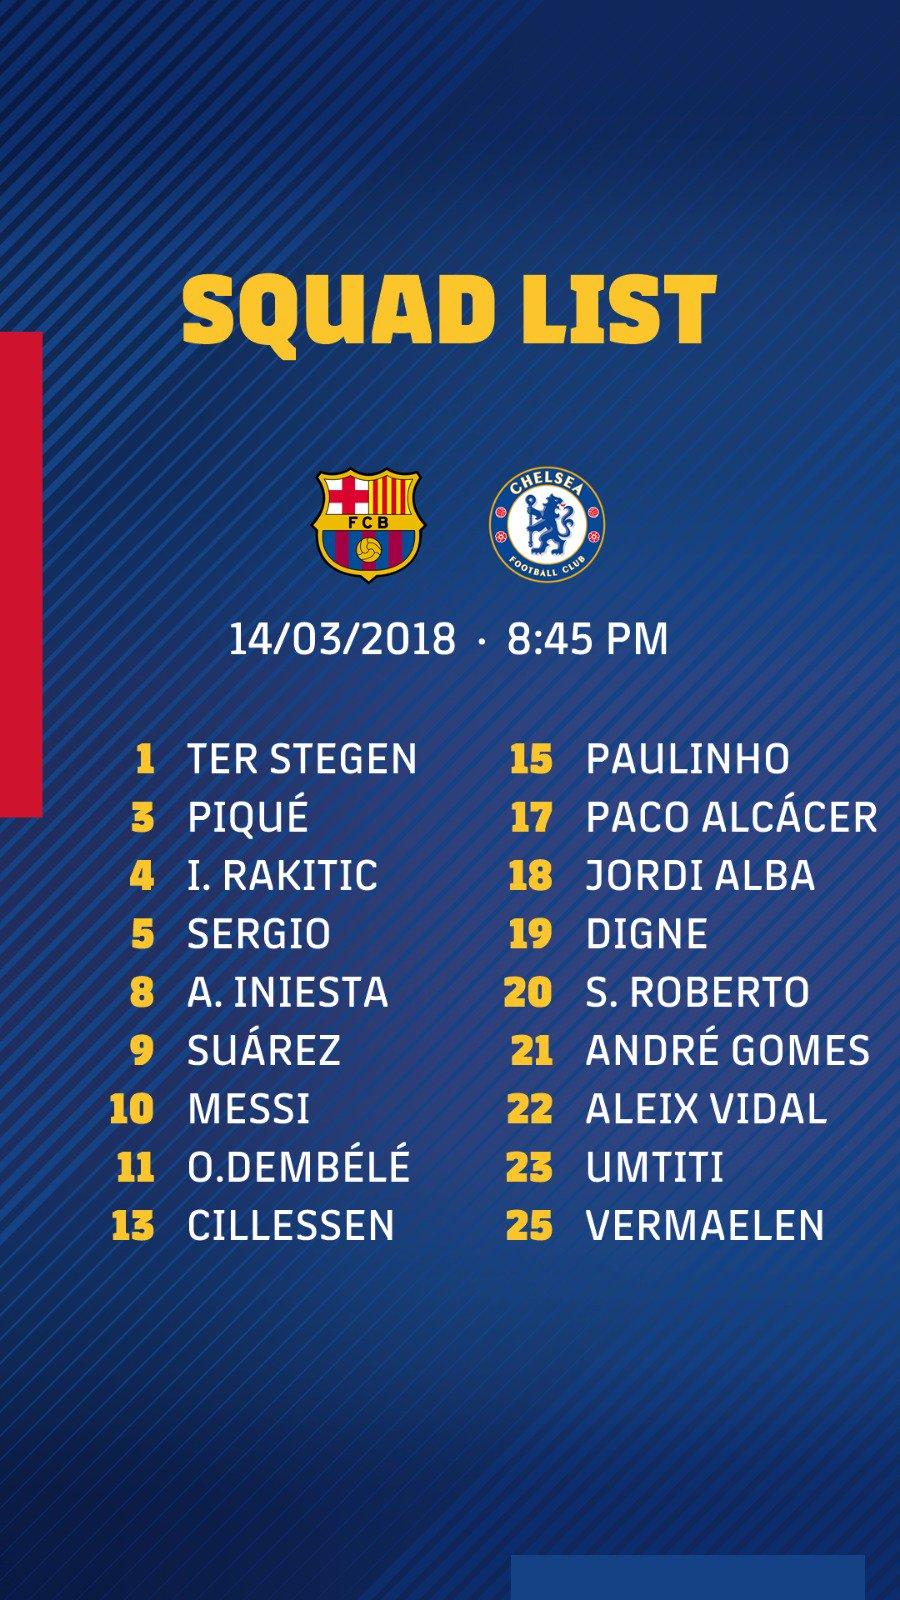 �� Squad list ���� #BarçaChelsea https://t.co/7YgKzKnl1U